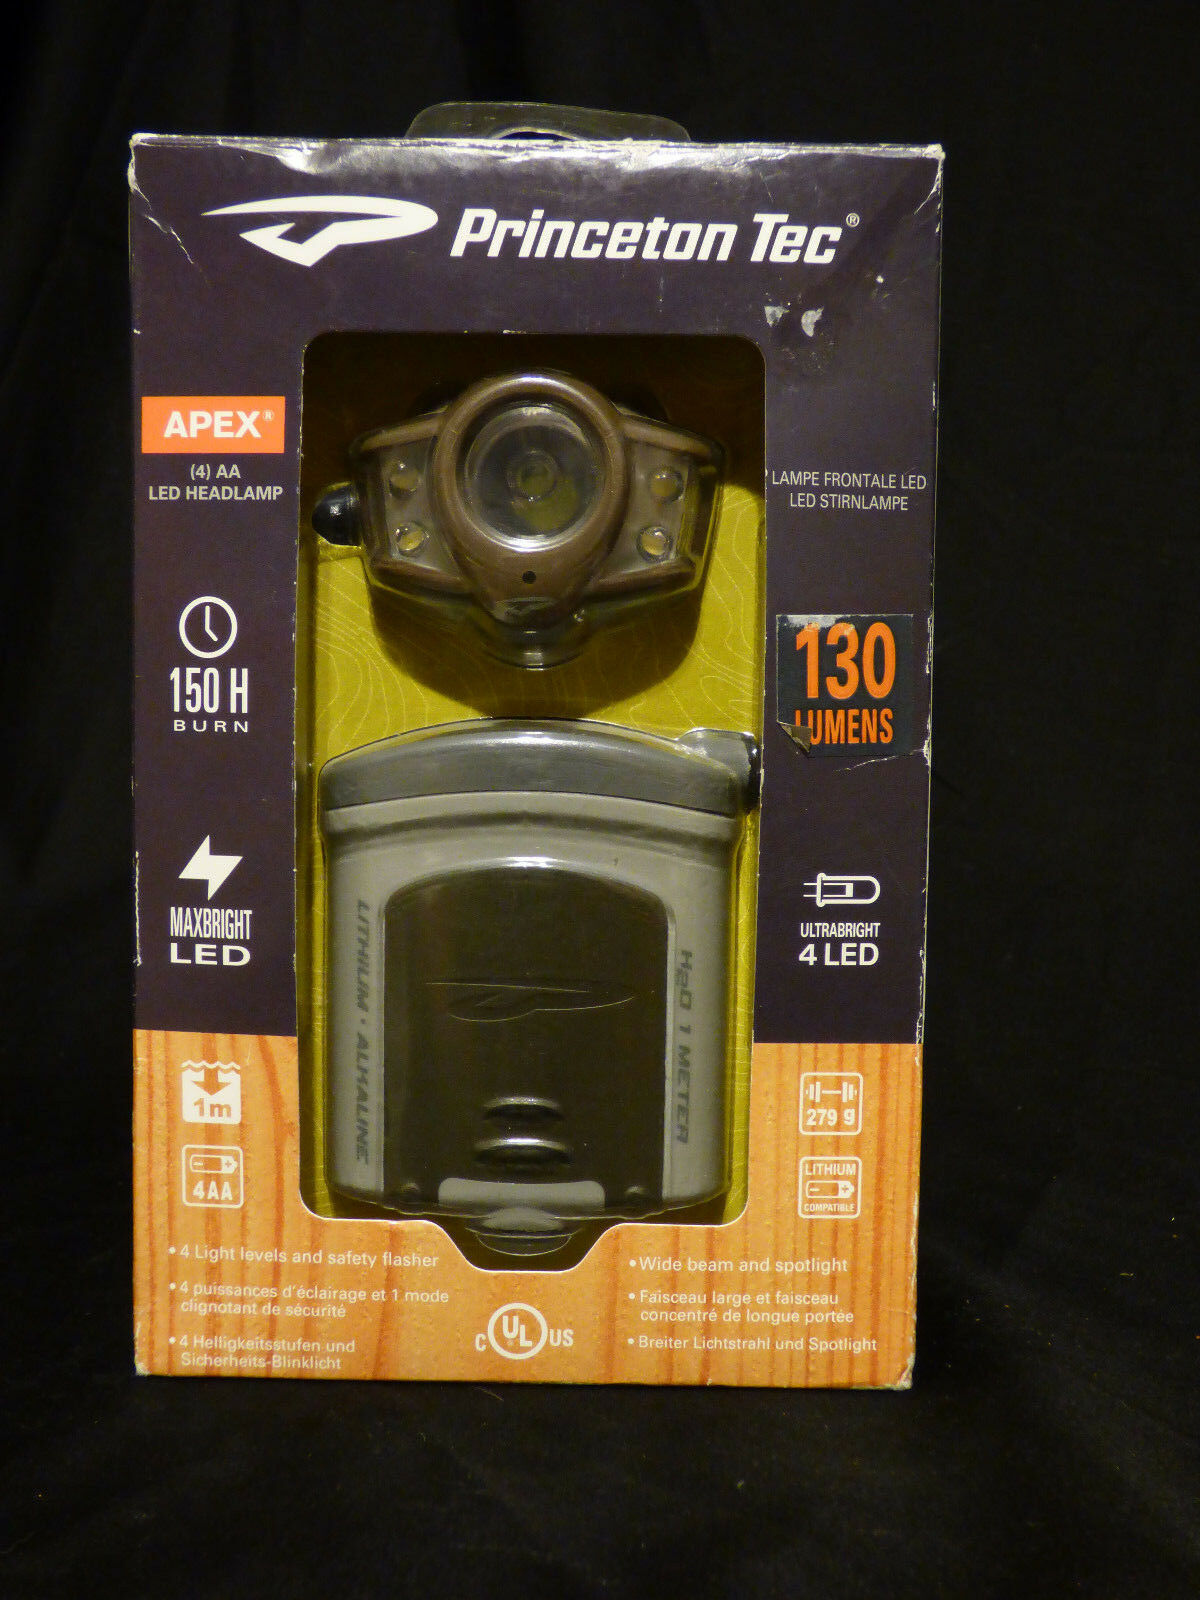 Princeton Tec Apex 130 lm Maxbright DEL tête Lampe